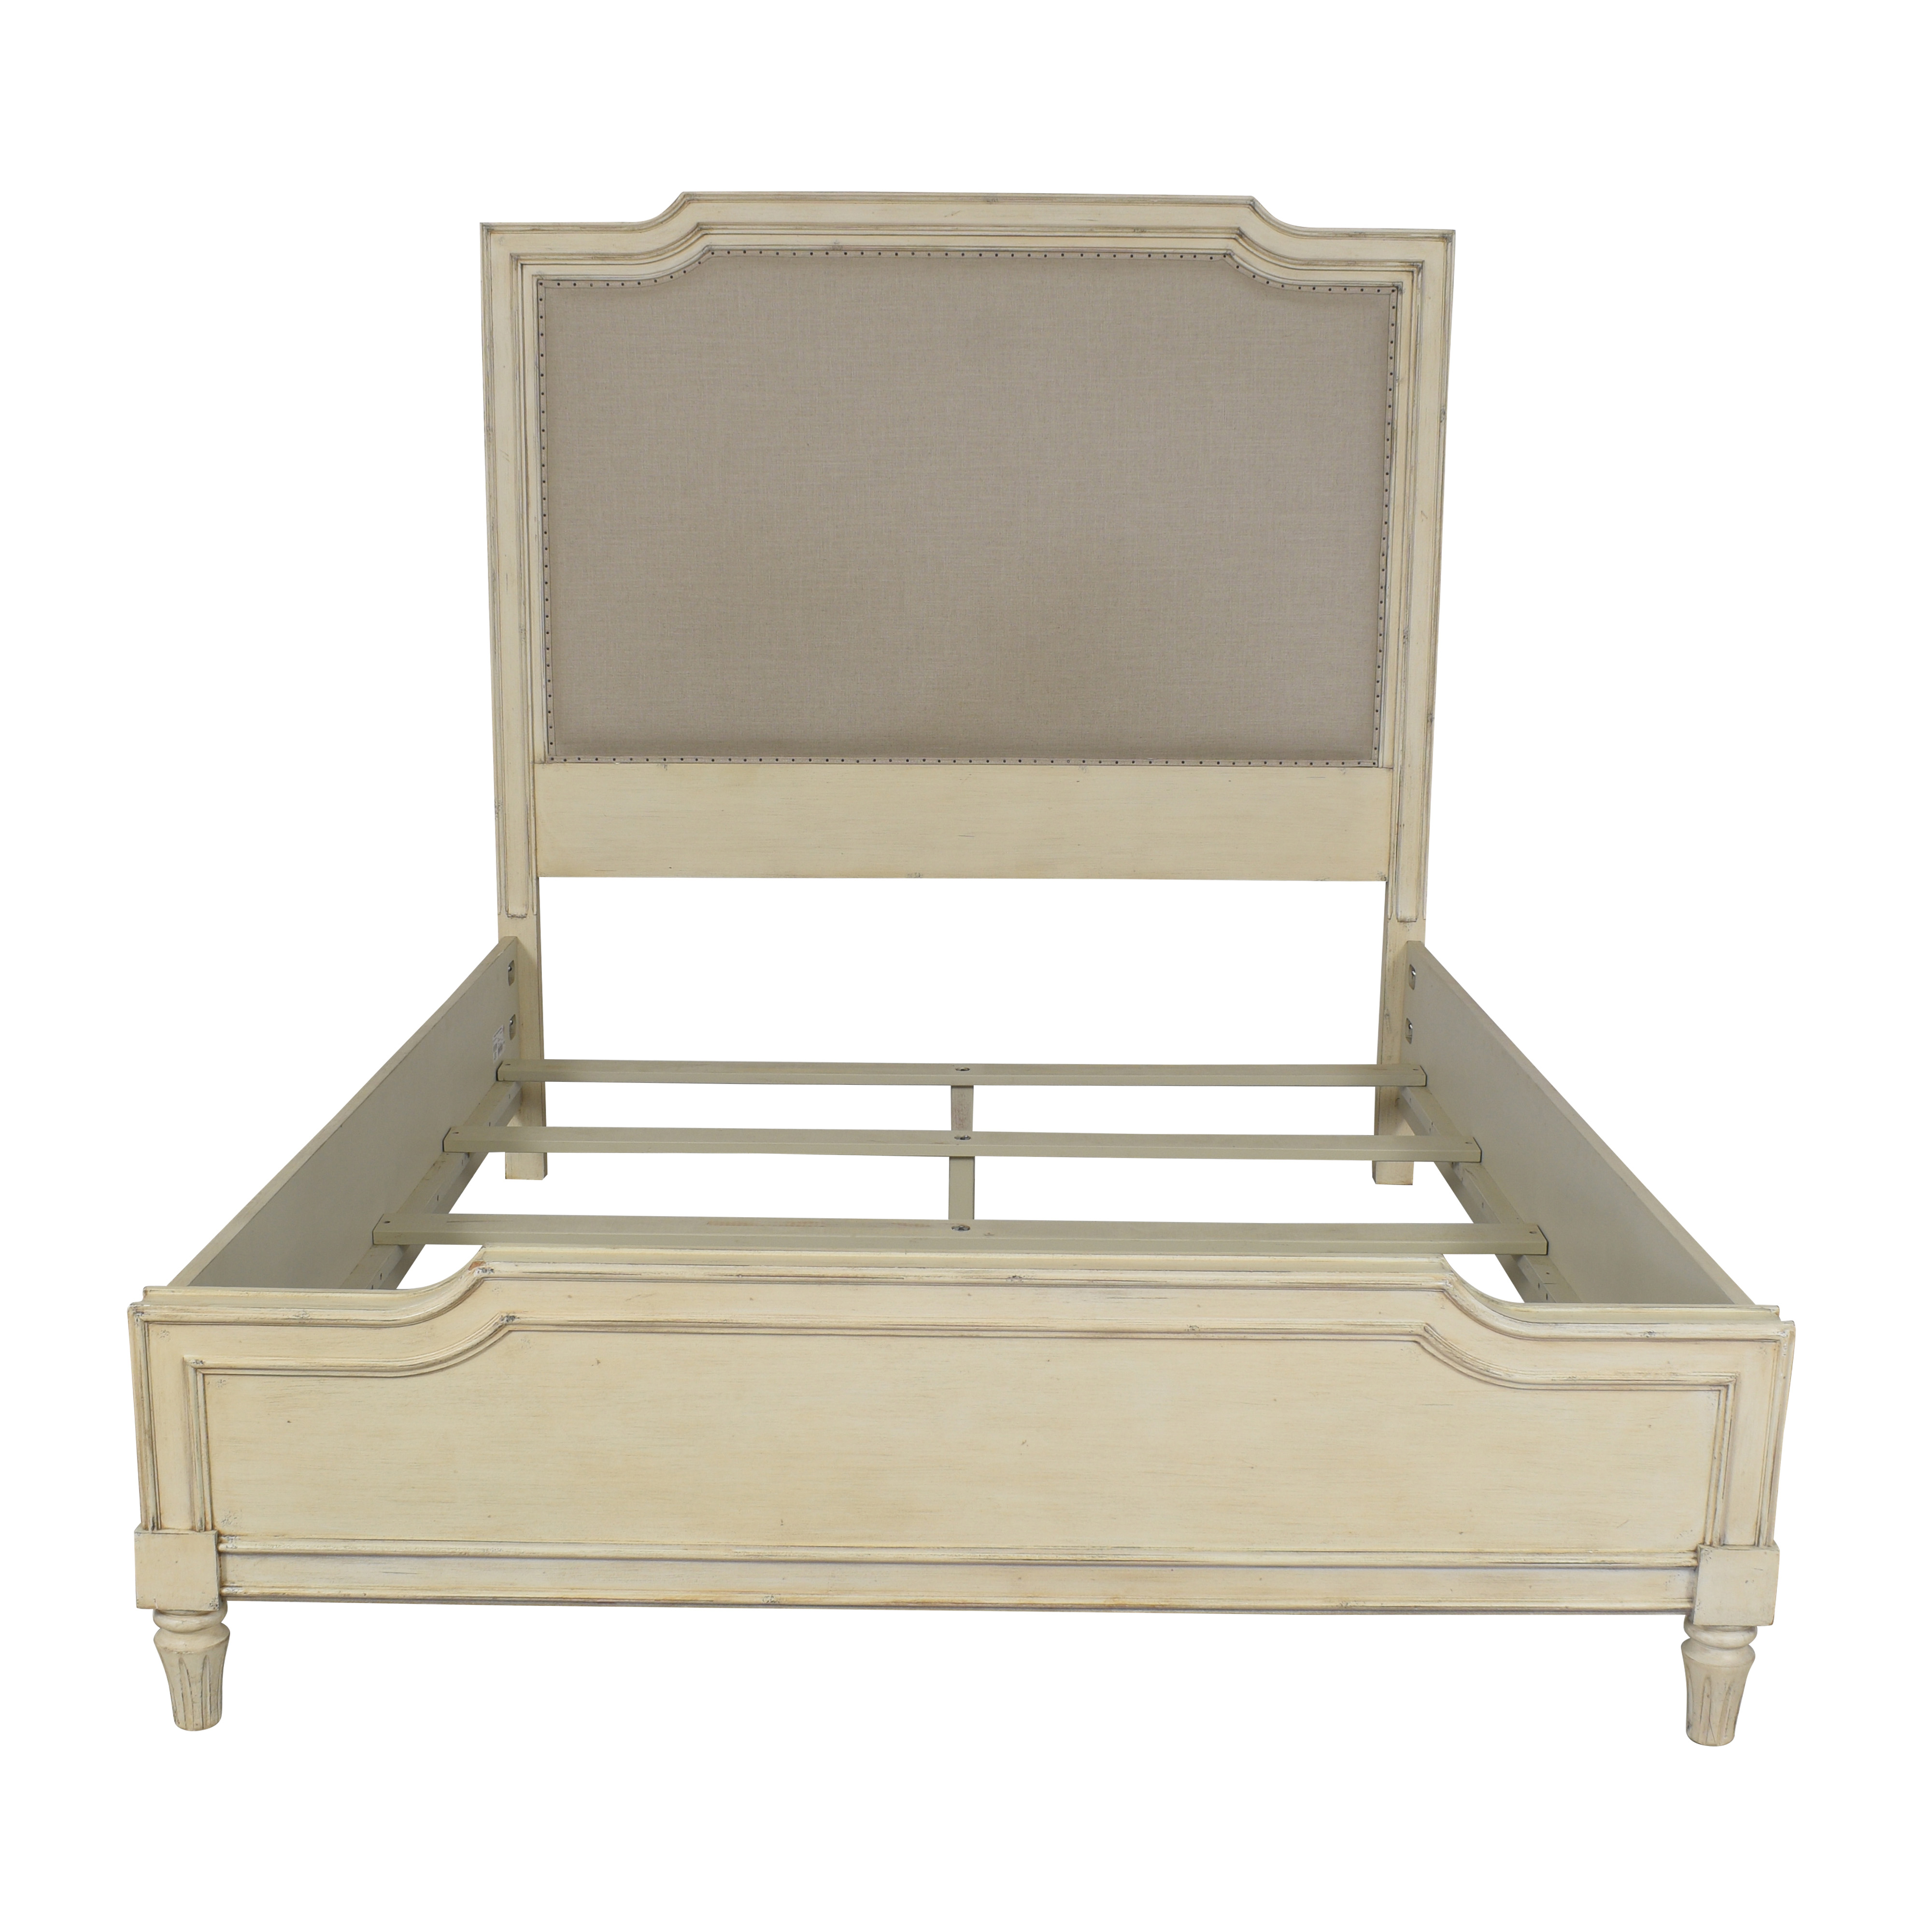 Stanley Furniture Stanley Furniture French Panel Platform Bed ma